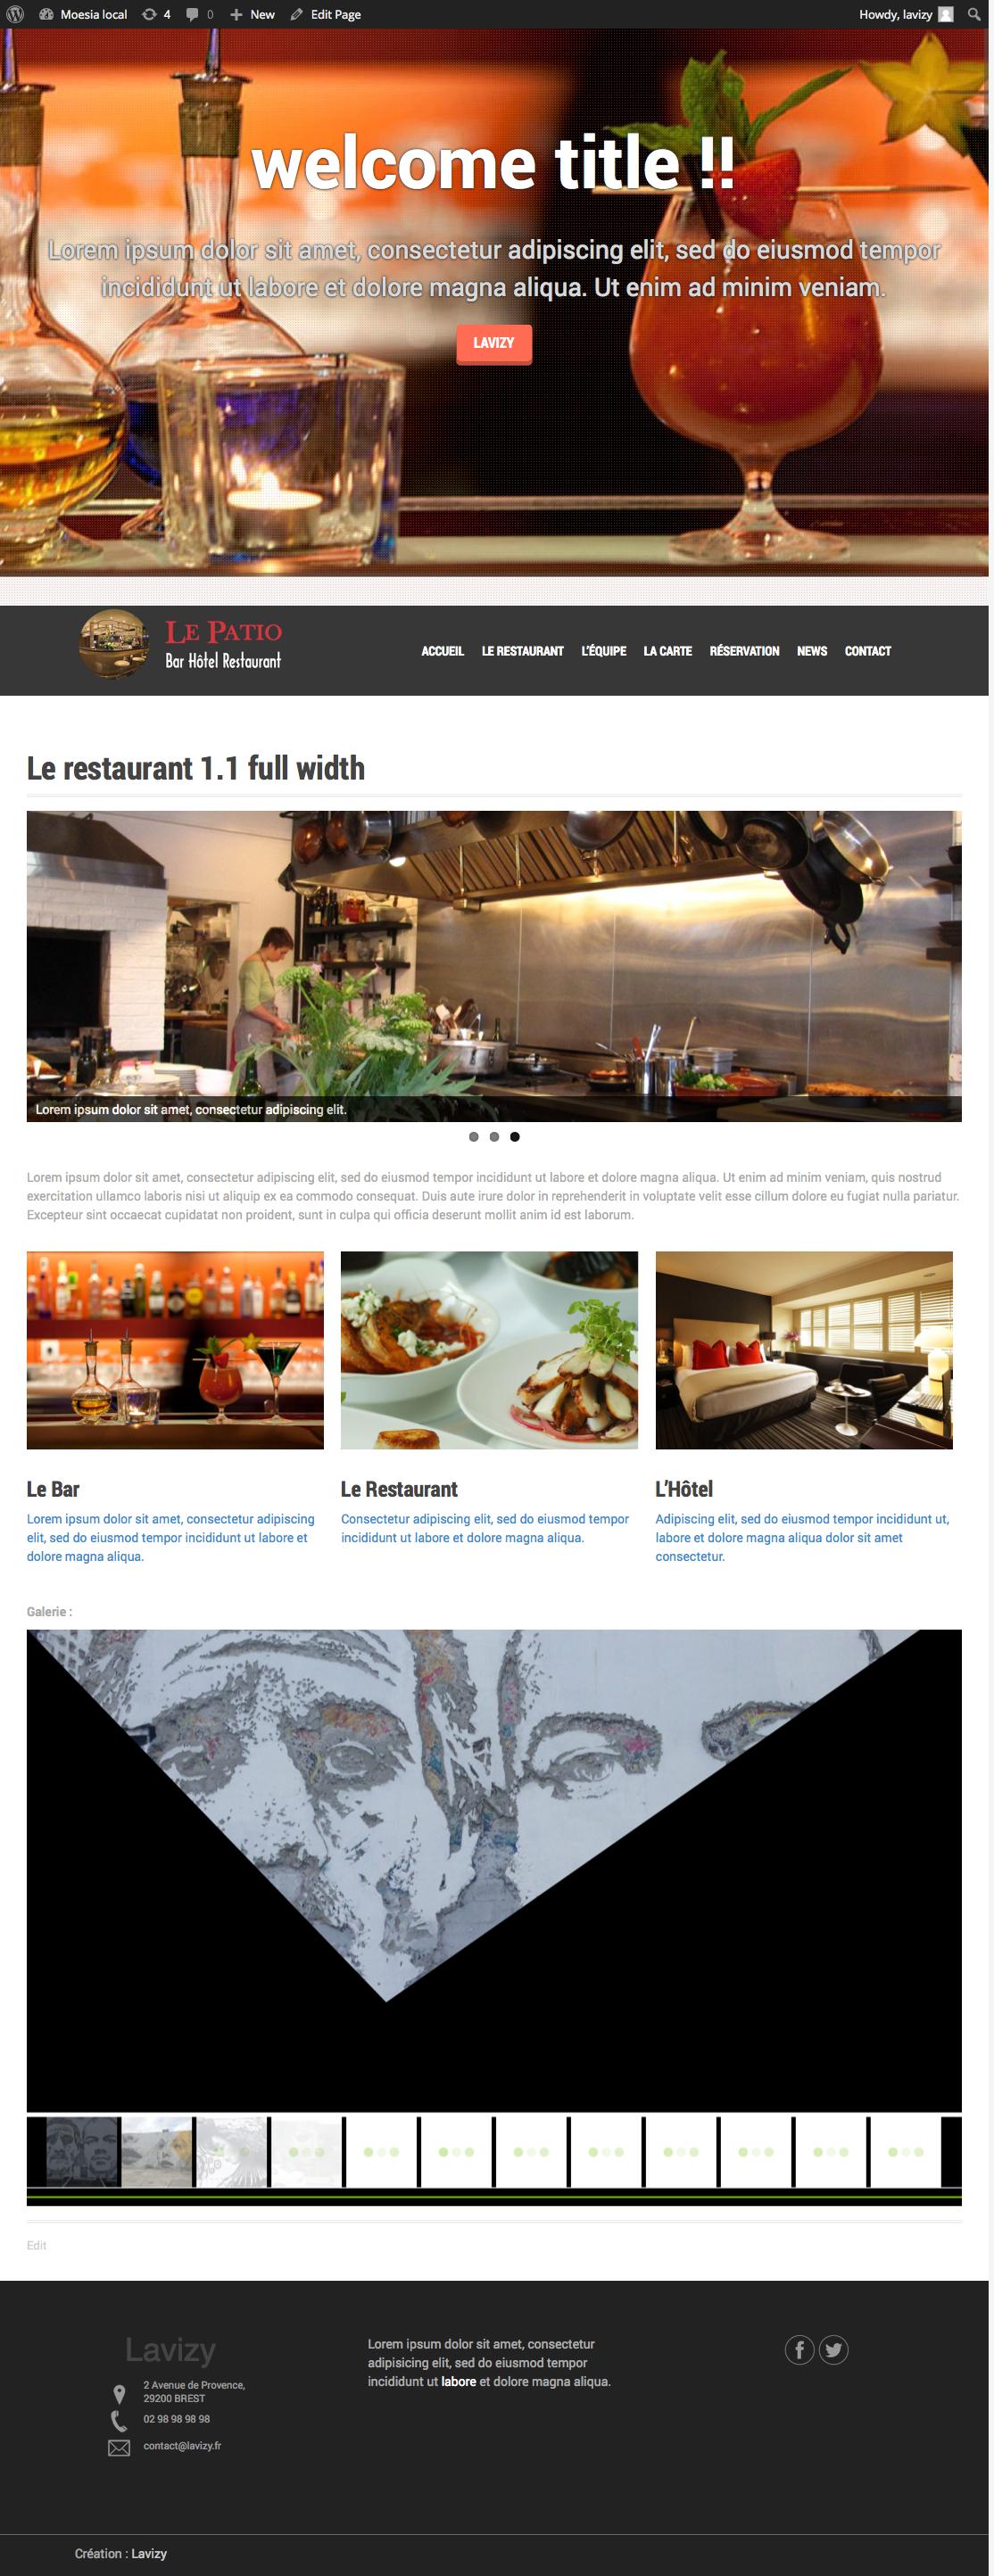 Le restaurant 1.1 full width | Moesia local 2014-10-20 14-44-51